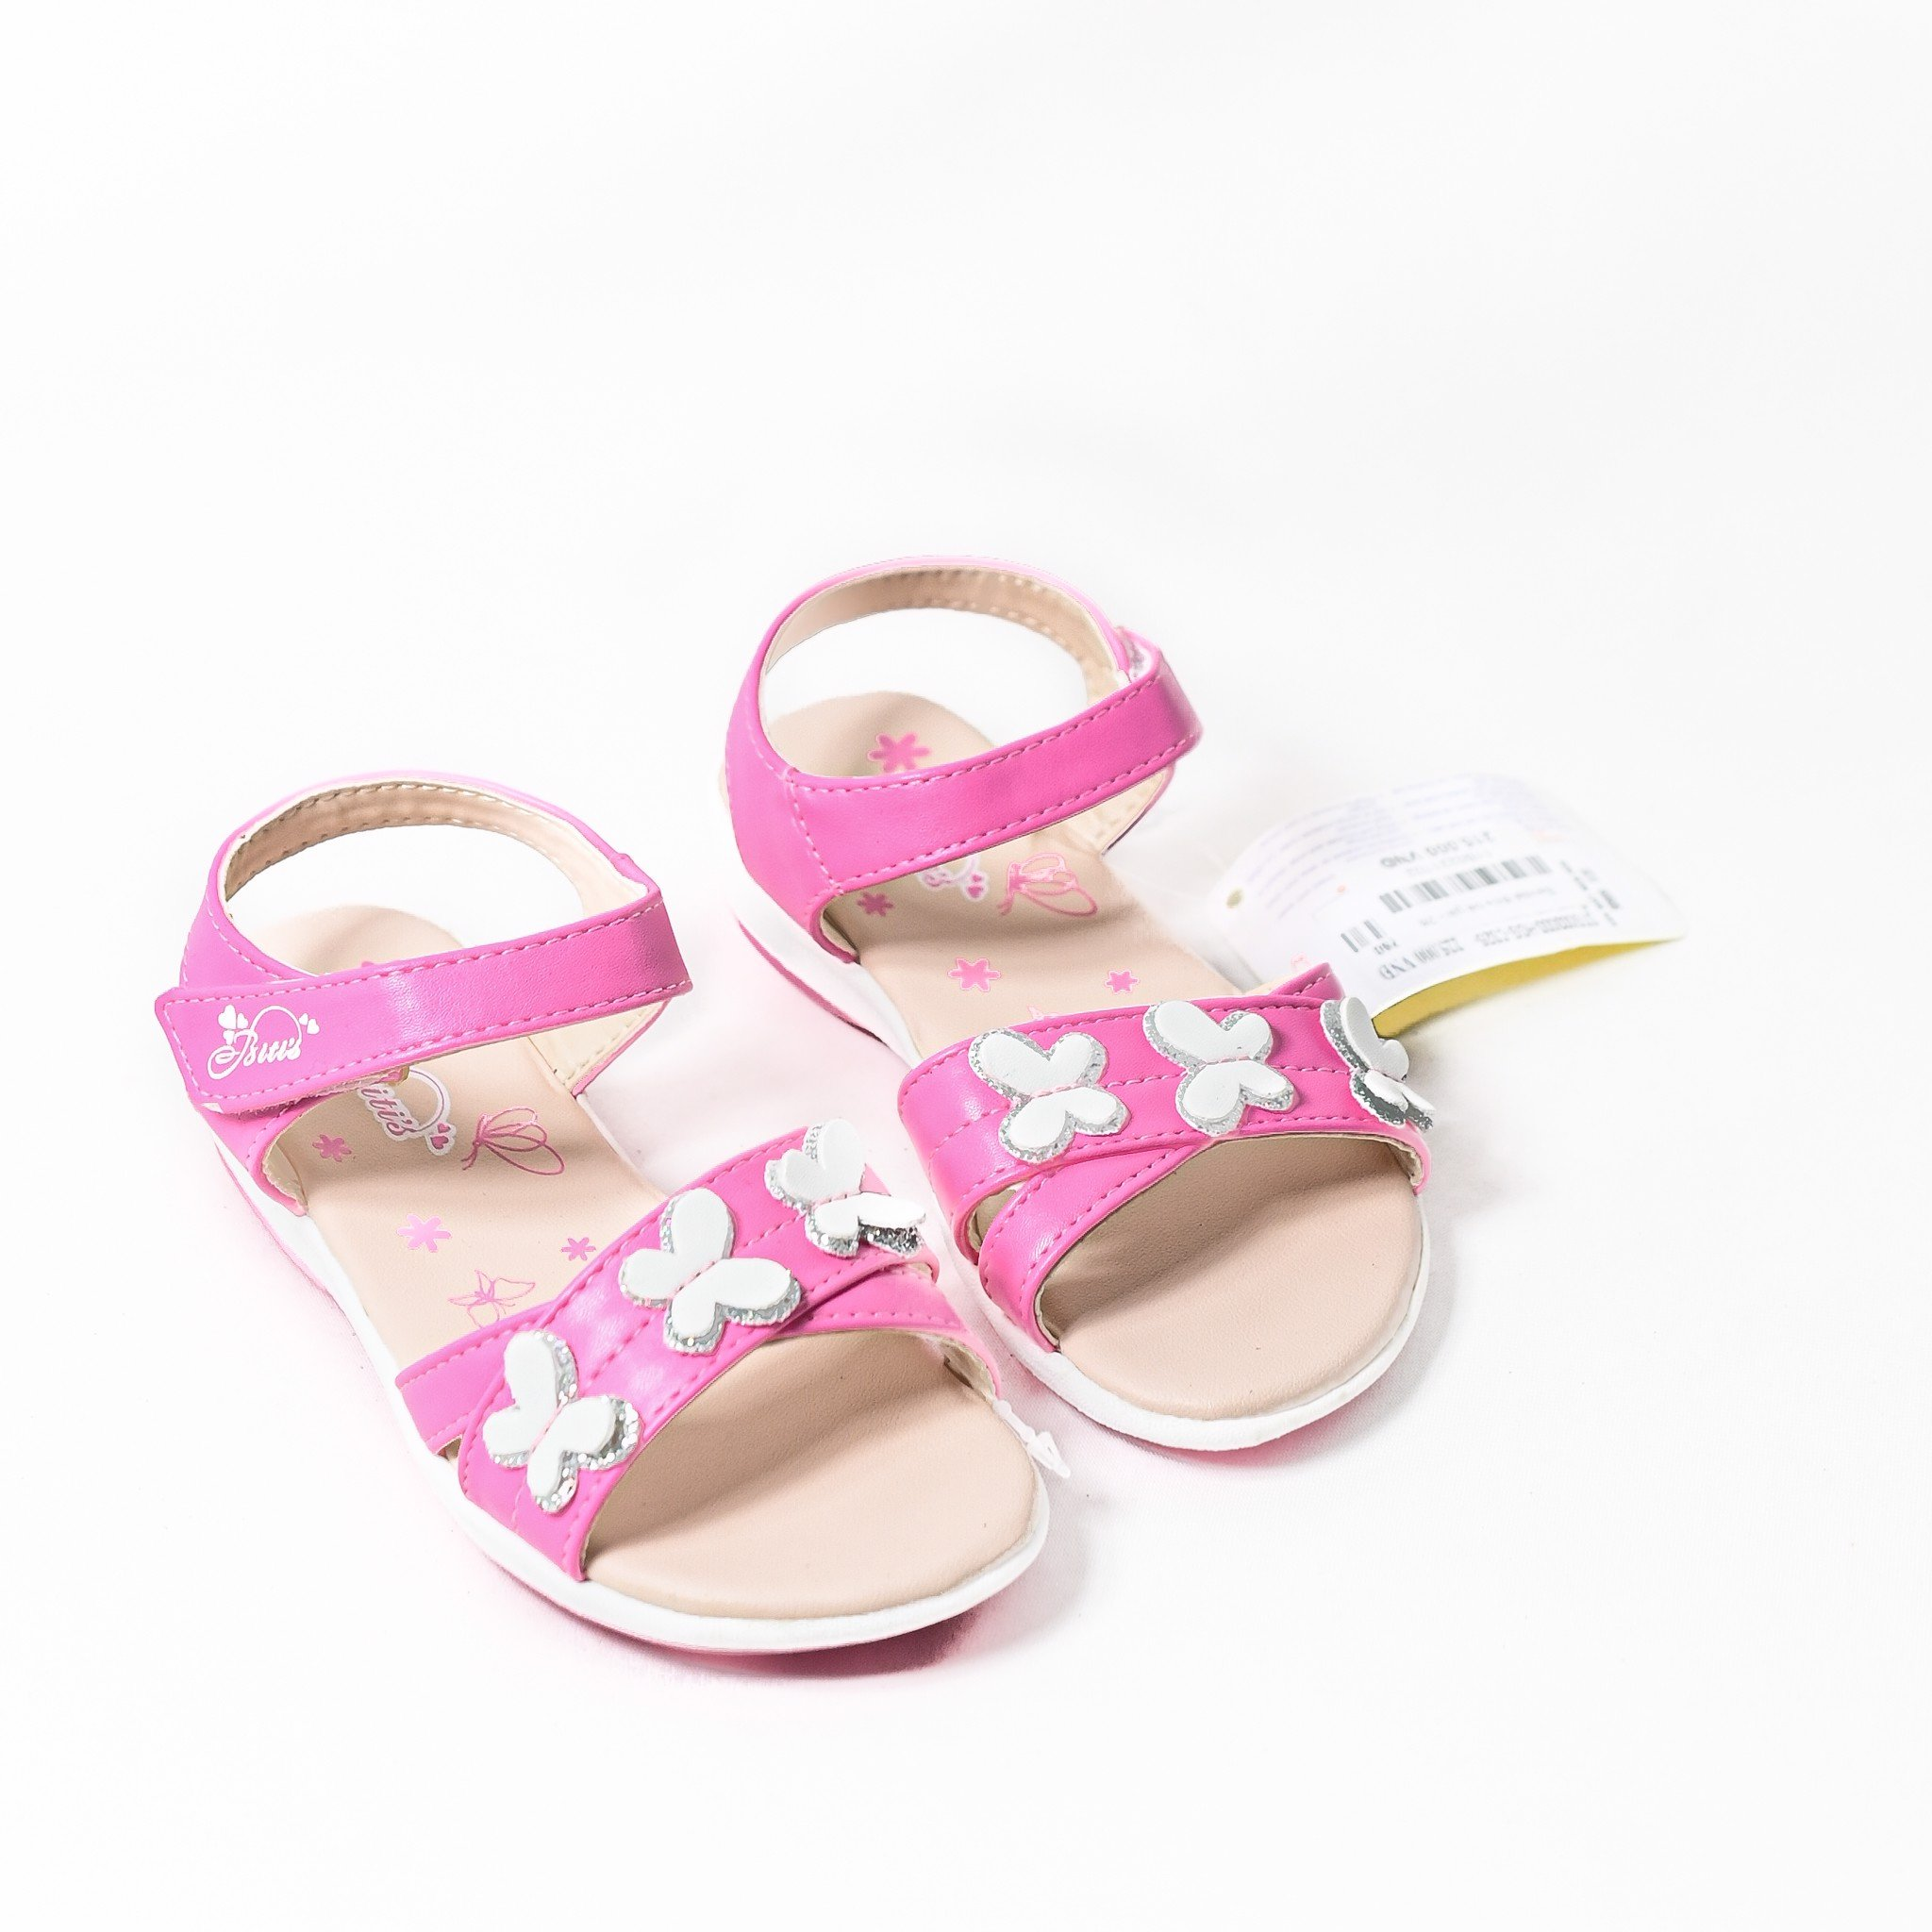 Sandal Bitis bé gái (size 24-29)